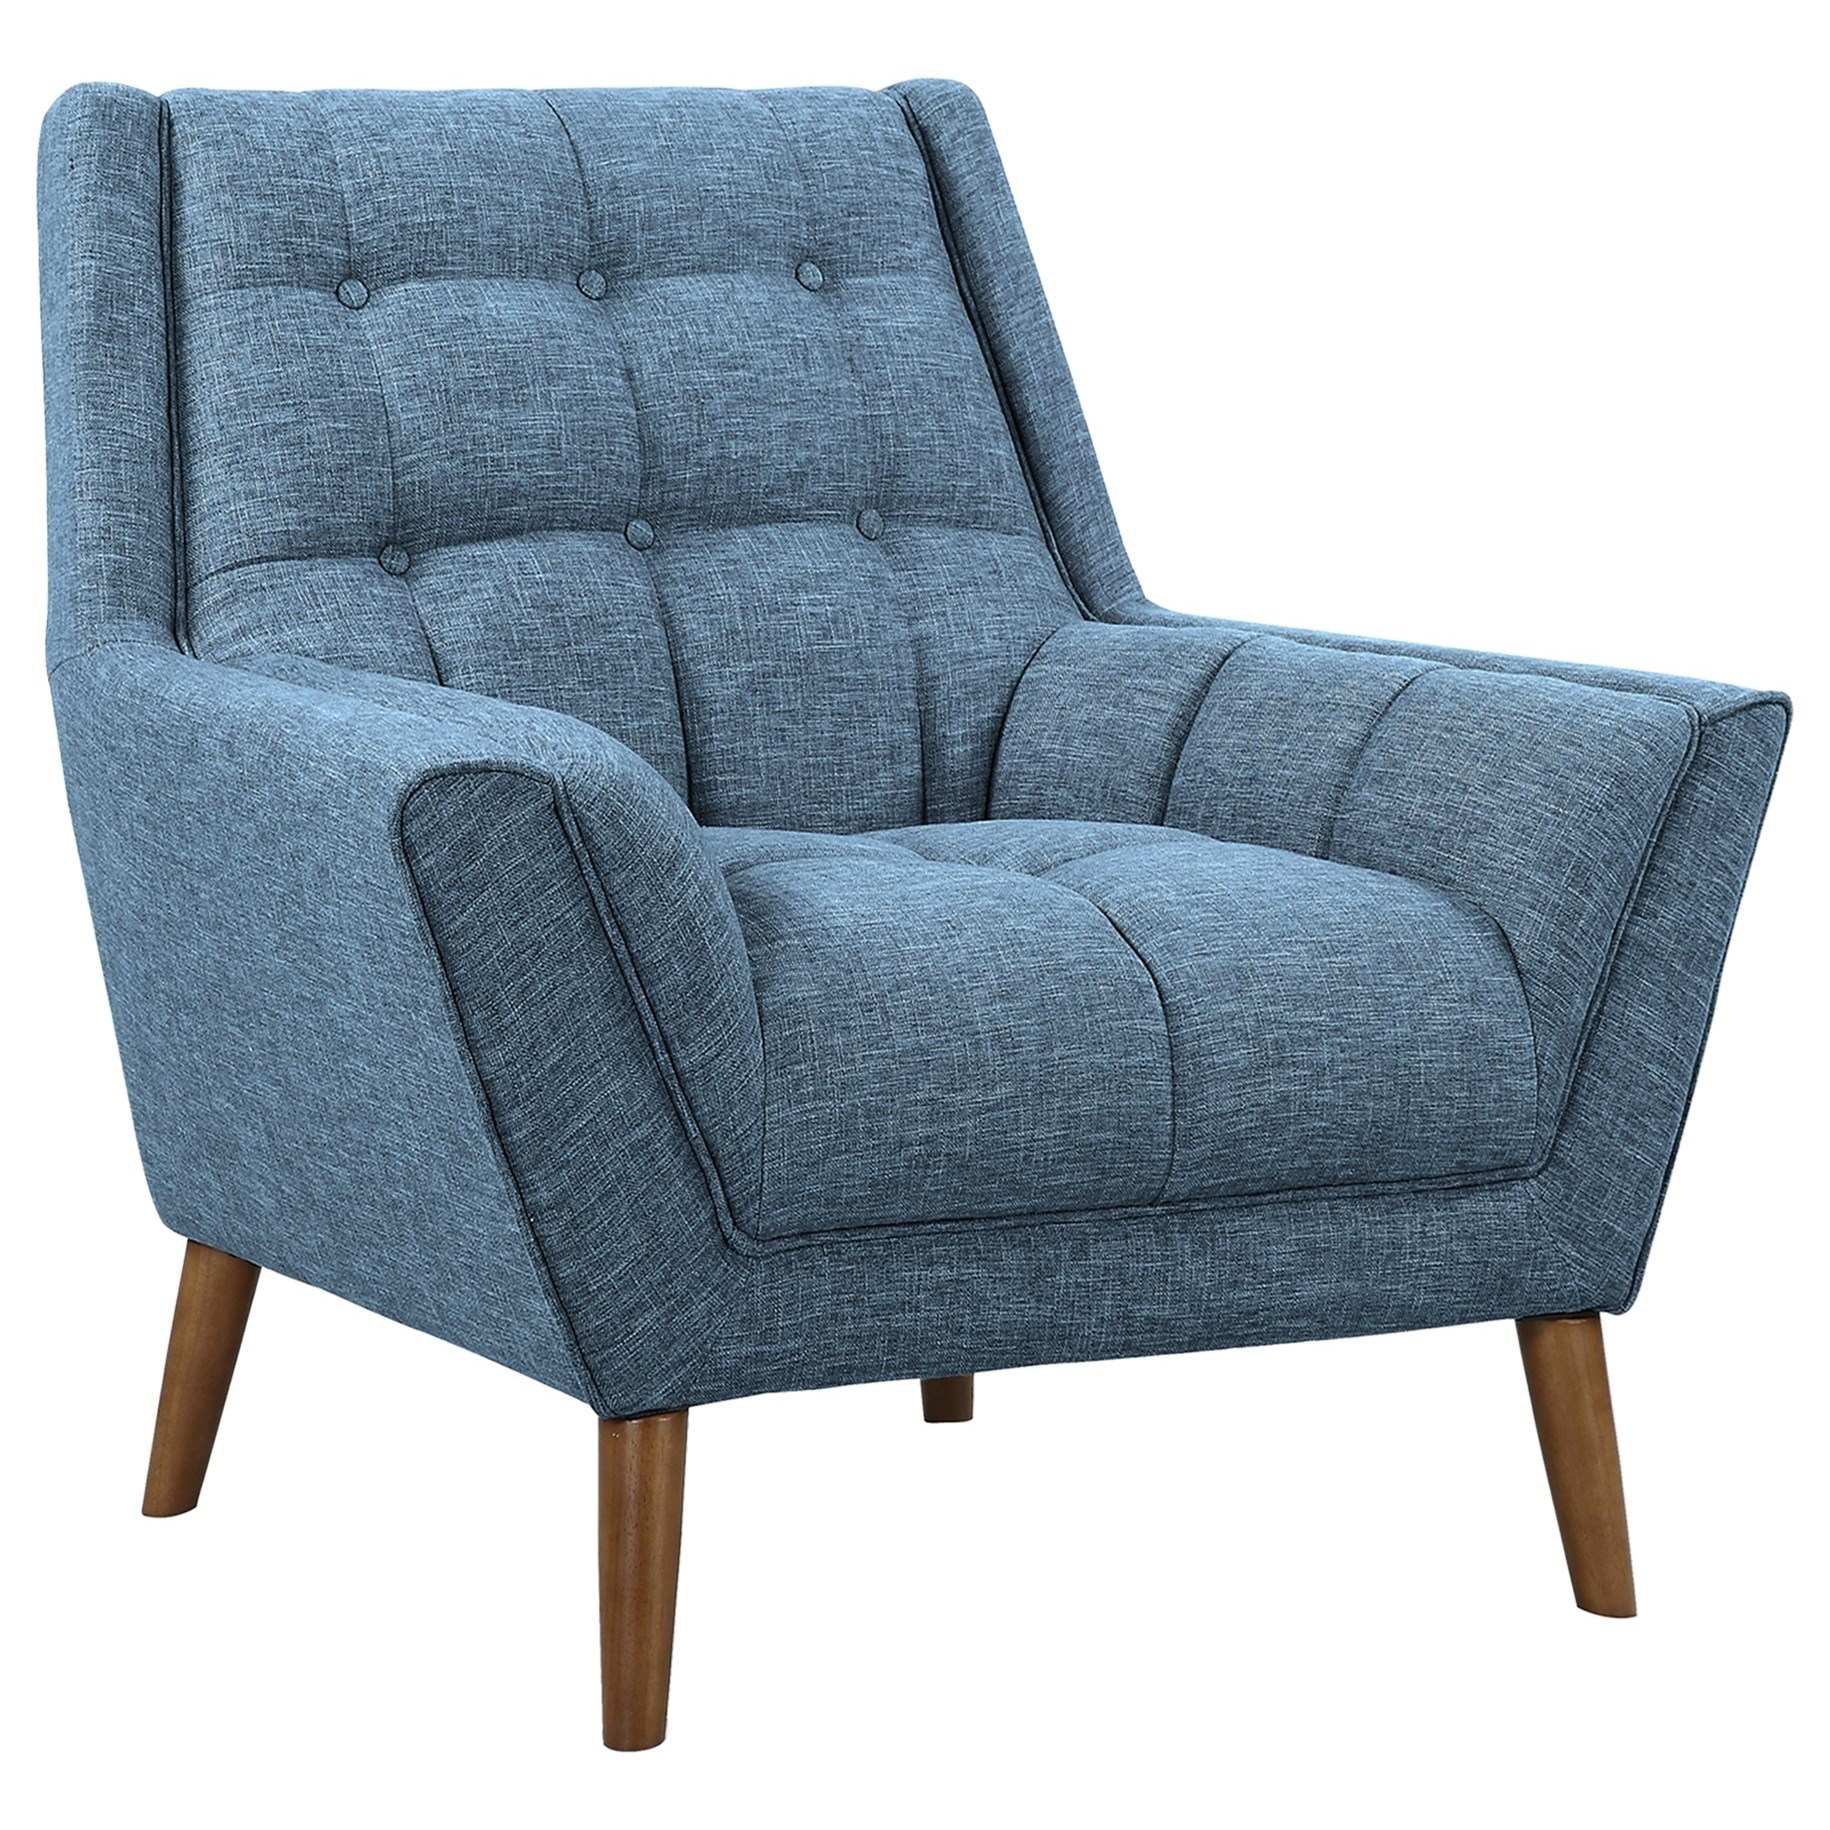 Cobra Chair at Sadler's Home Furnishings